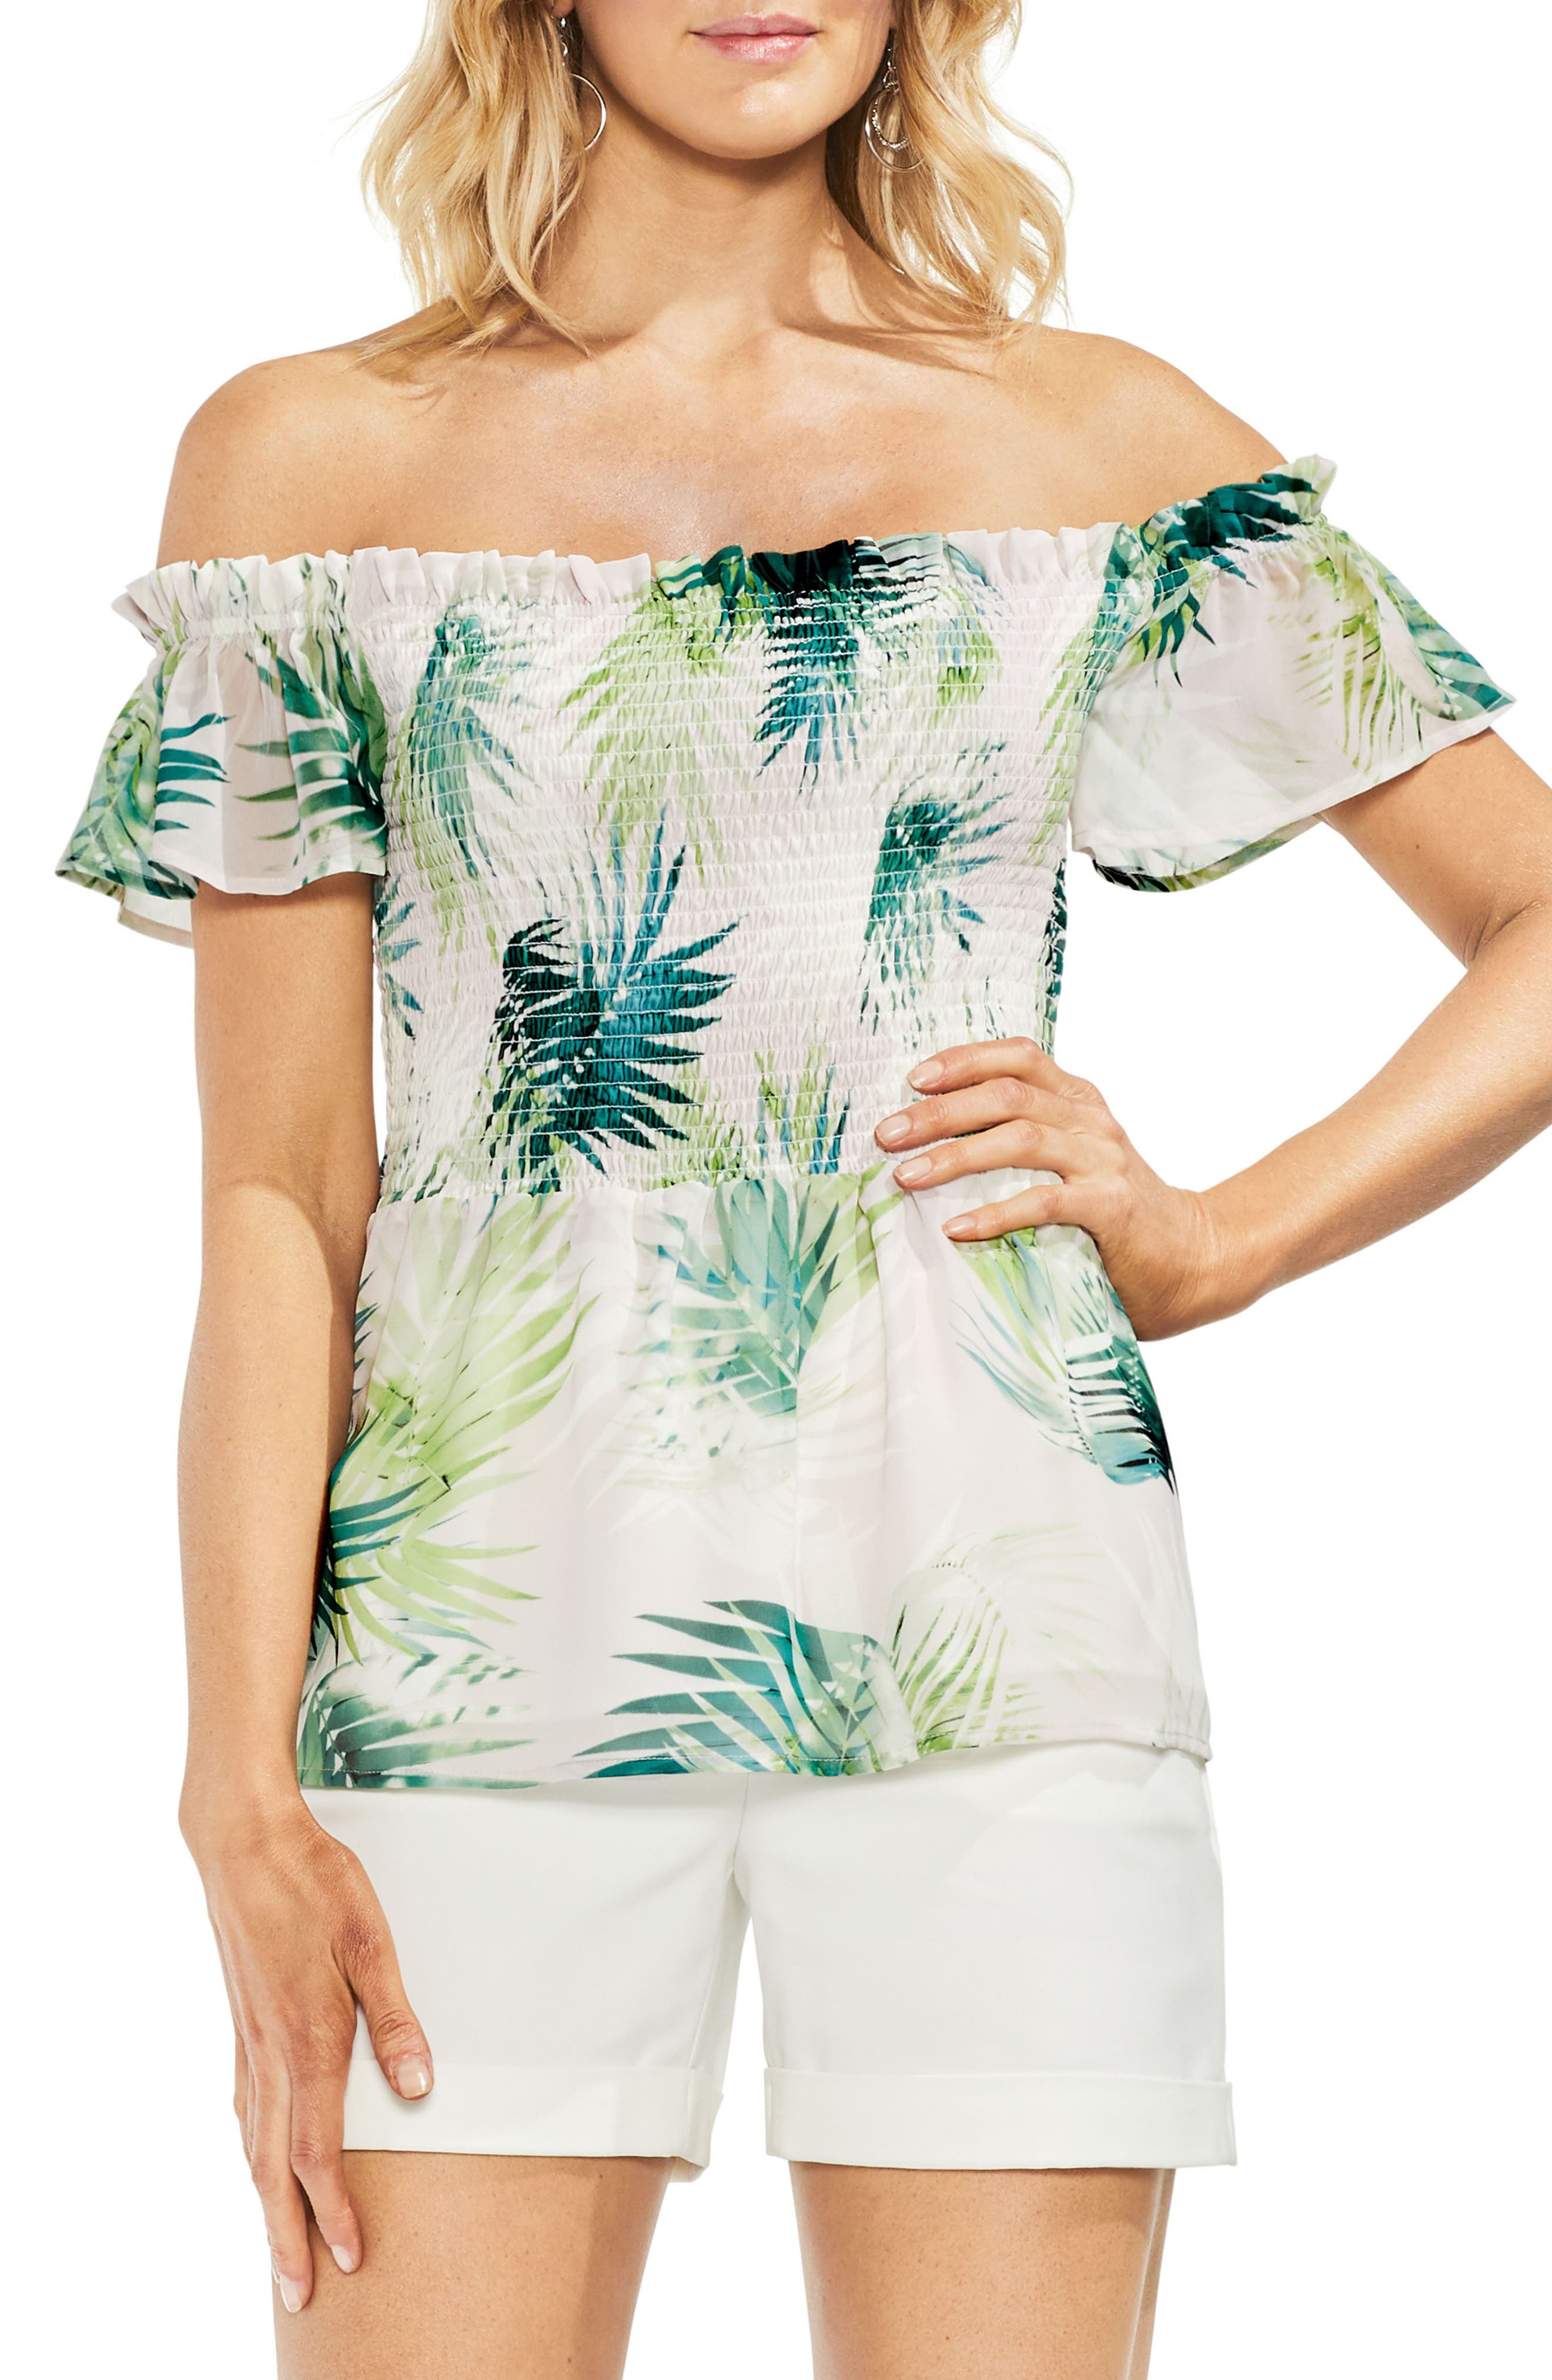 Sunlit Palm Off The Shoulder Top,                         Main,                         color, Verdant Green